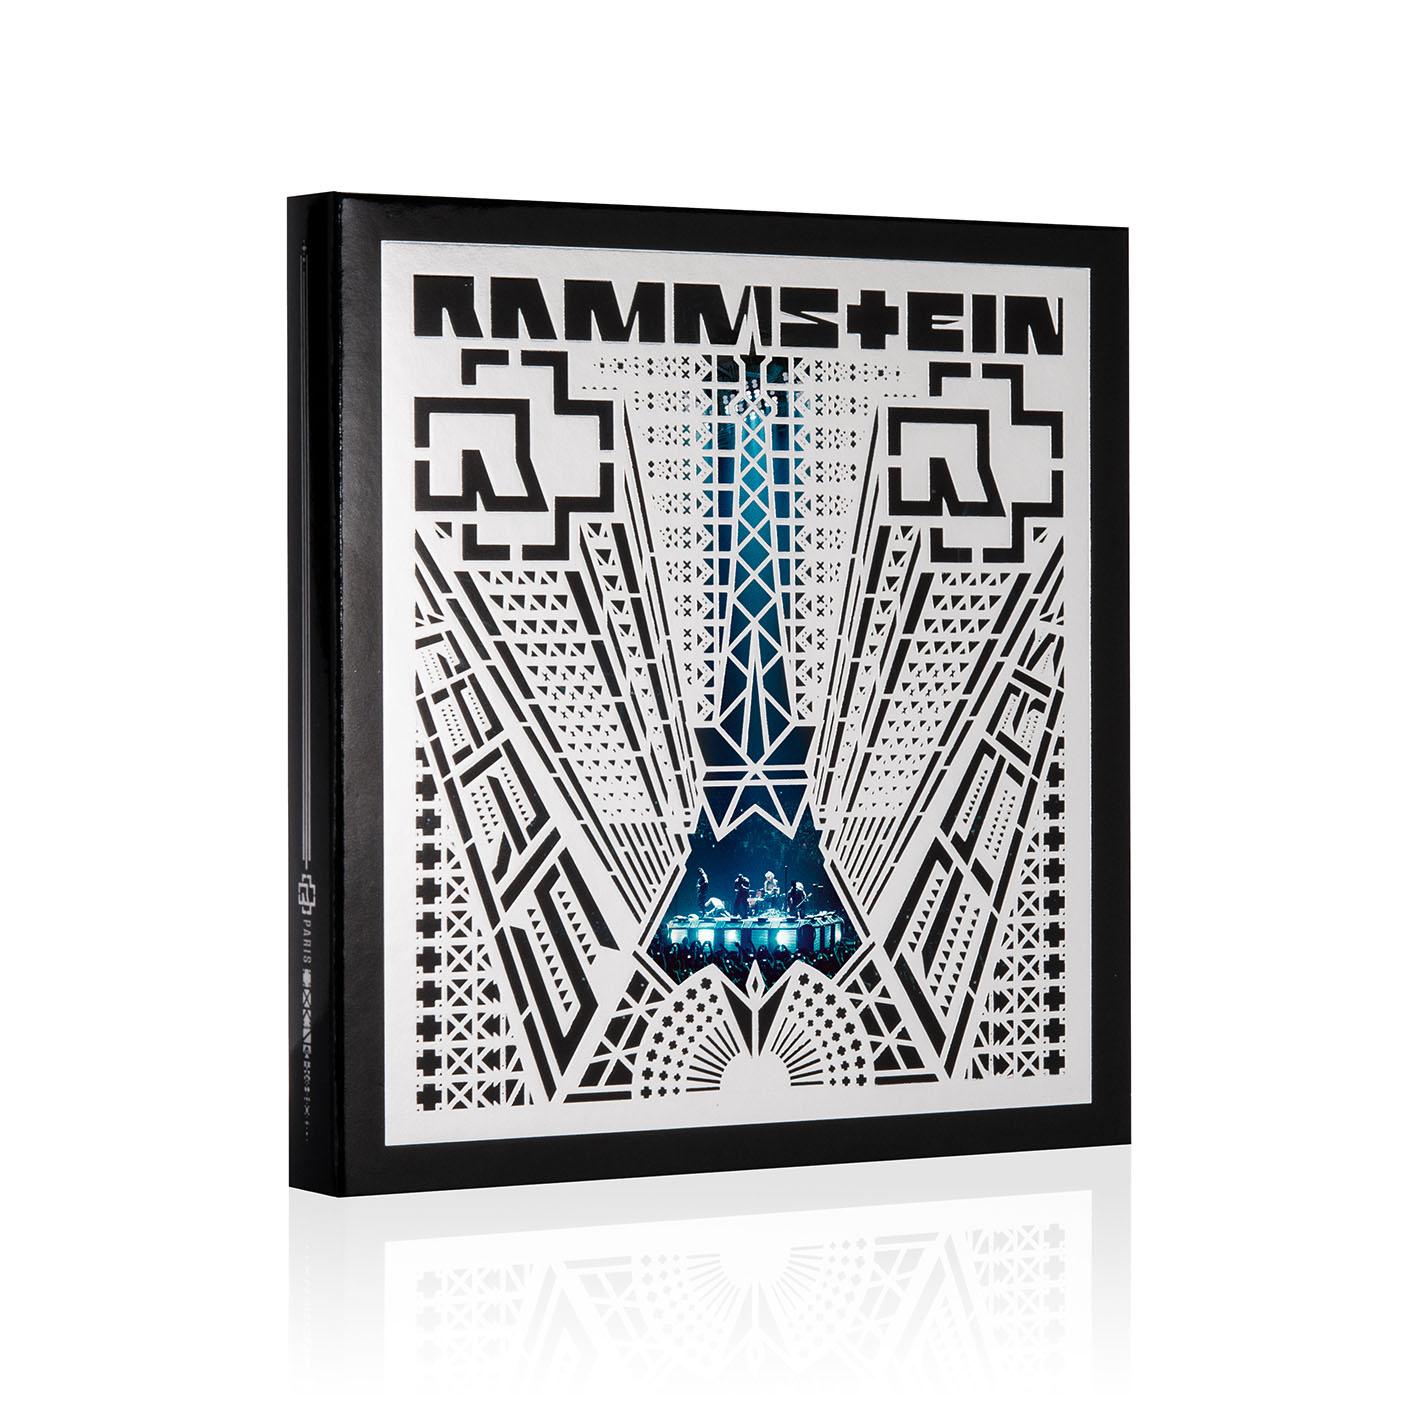 Rammstein Rammstein. Paris (2 CD) видео фильм балканский тупик россия